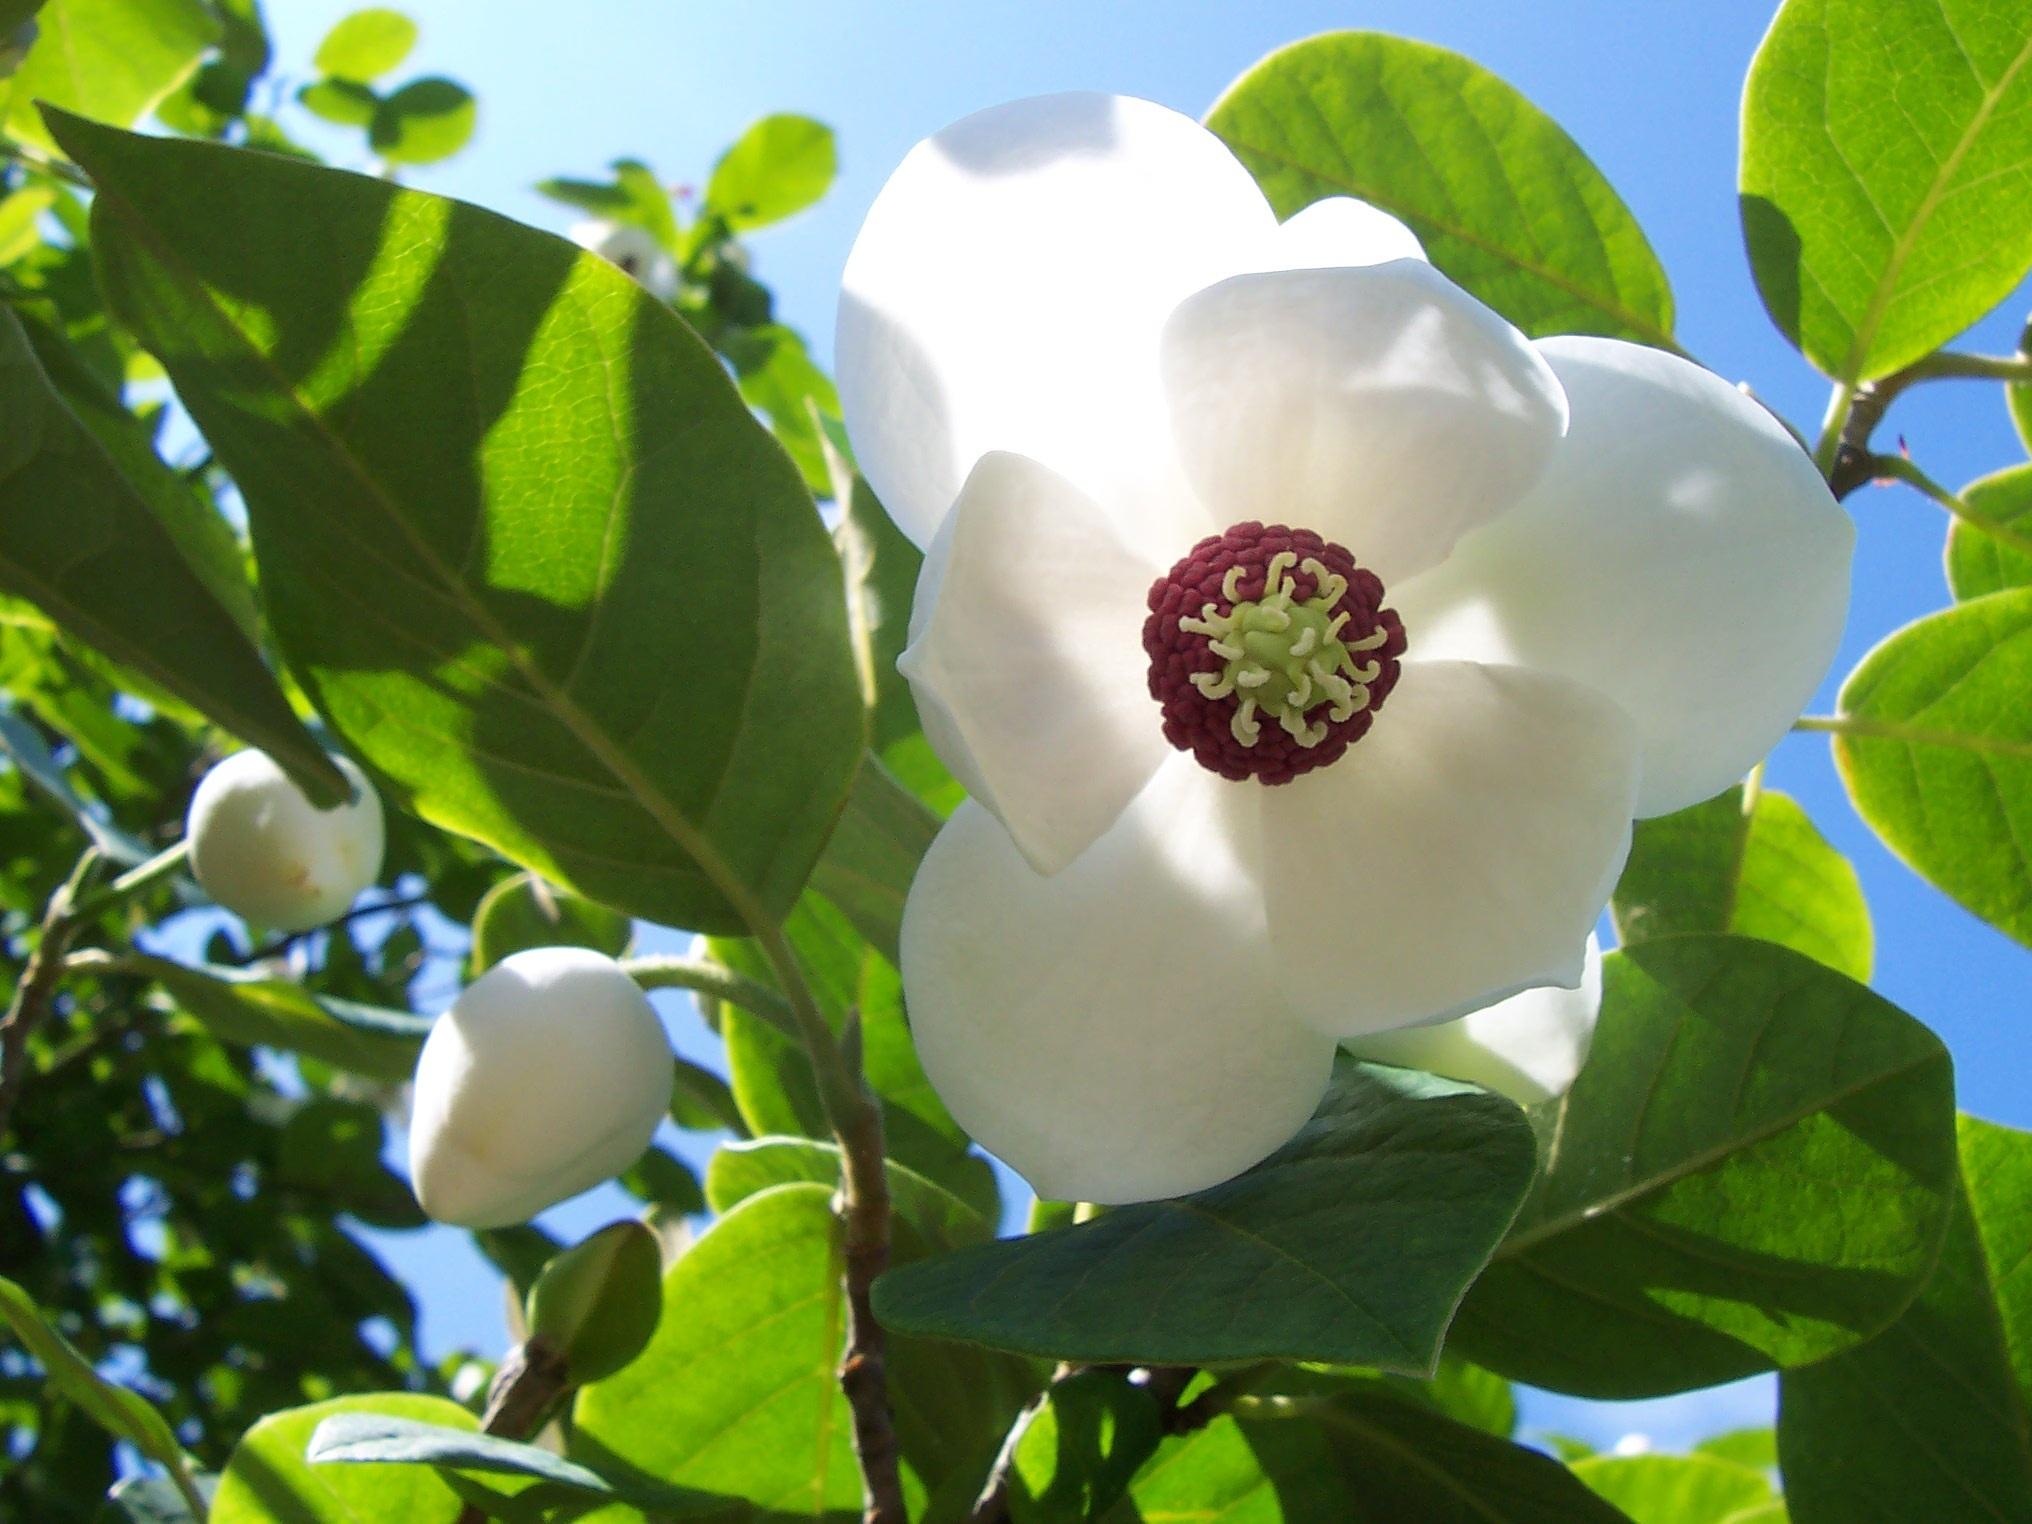 Unduh 72 Gambar Daun Bunga Raya Putih HD Gratid